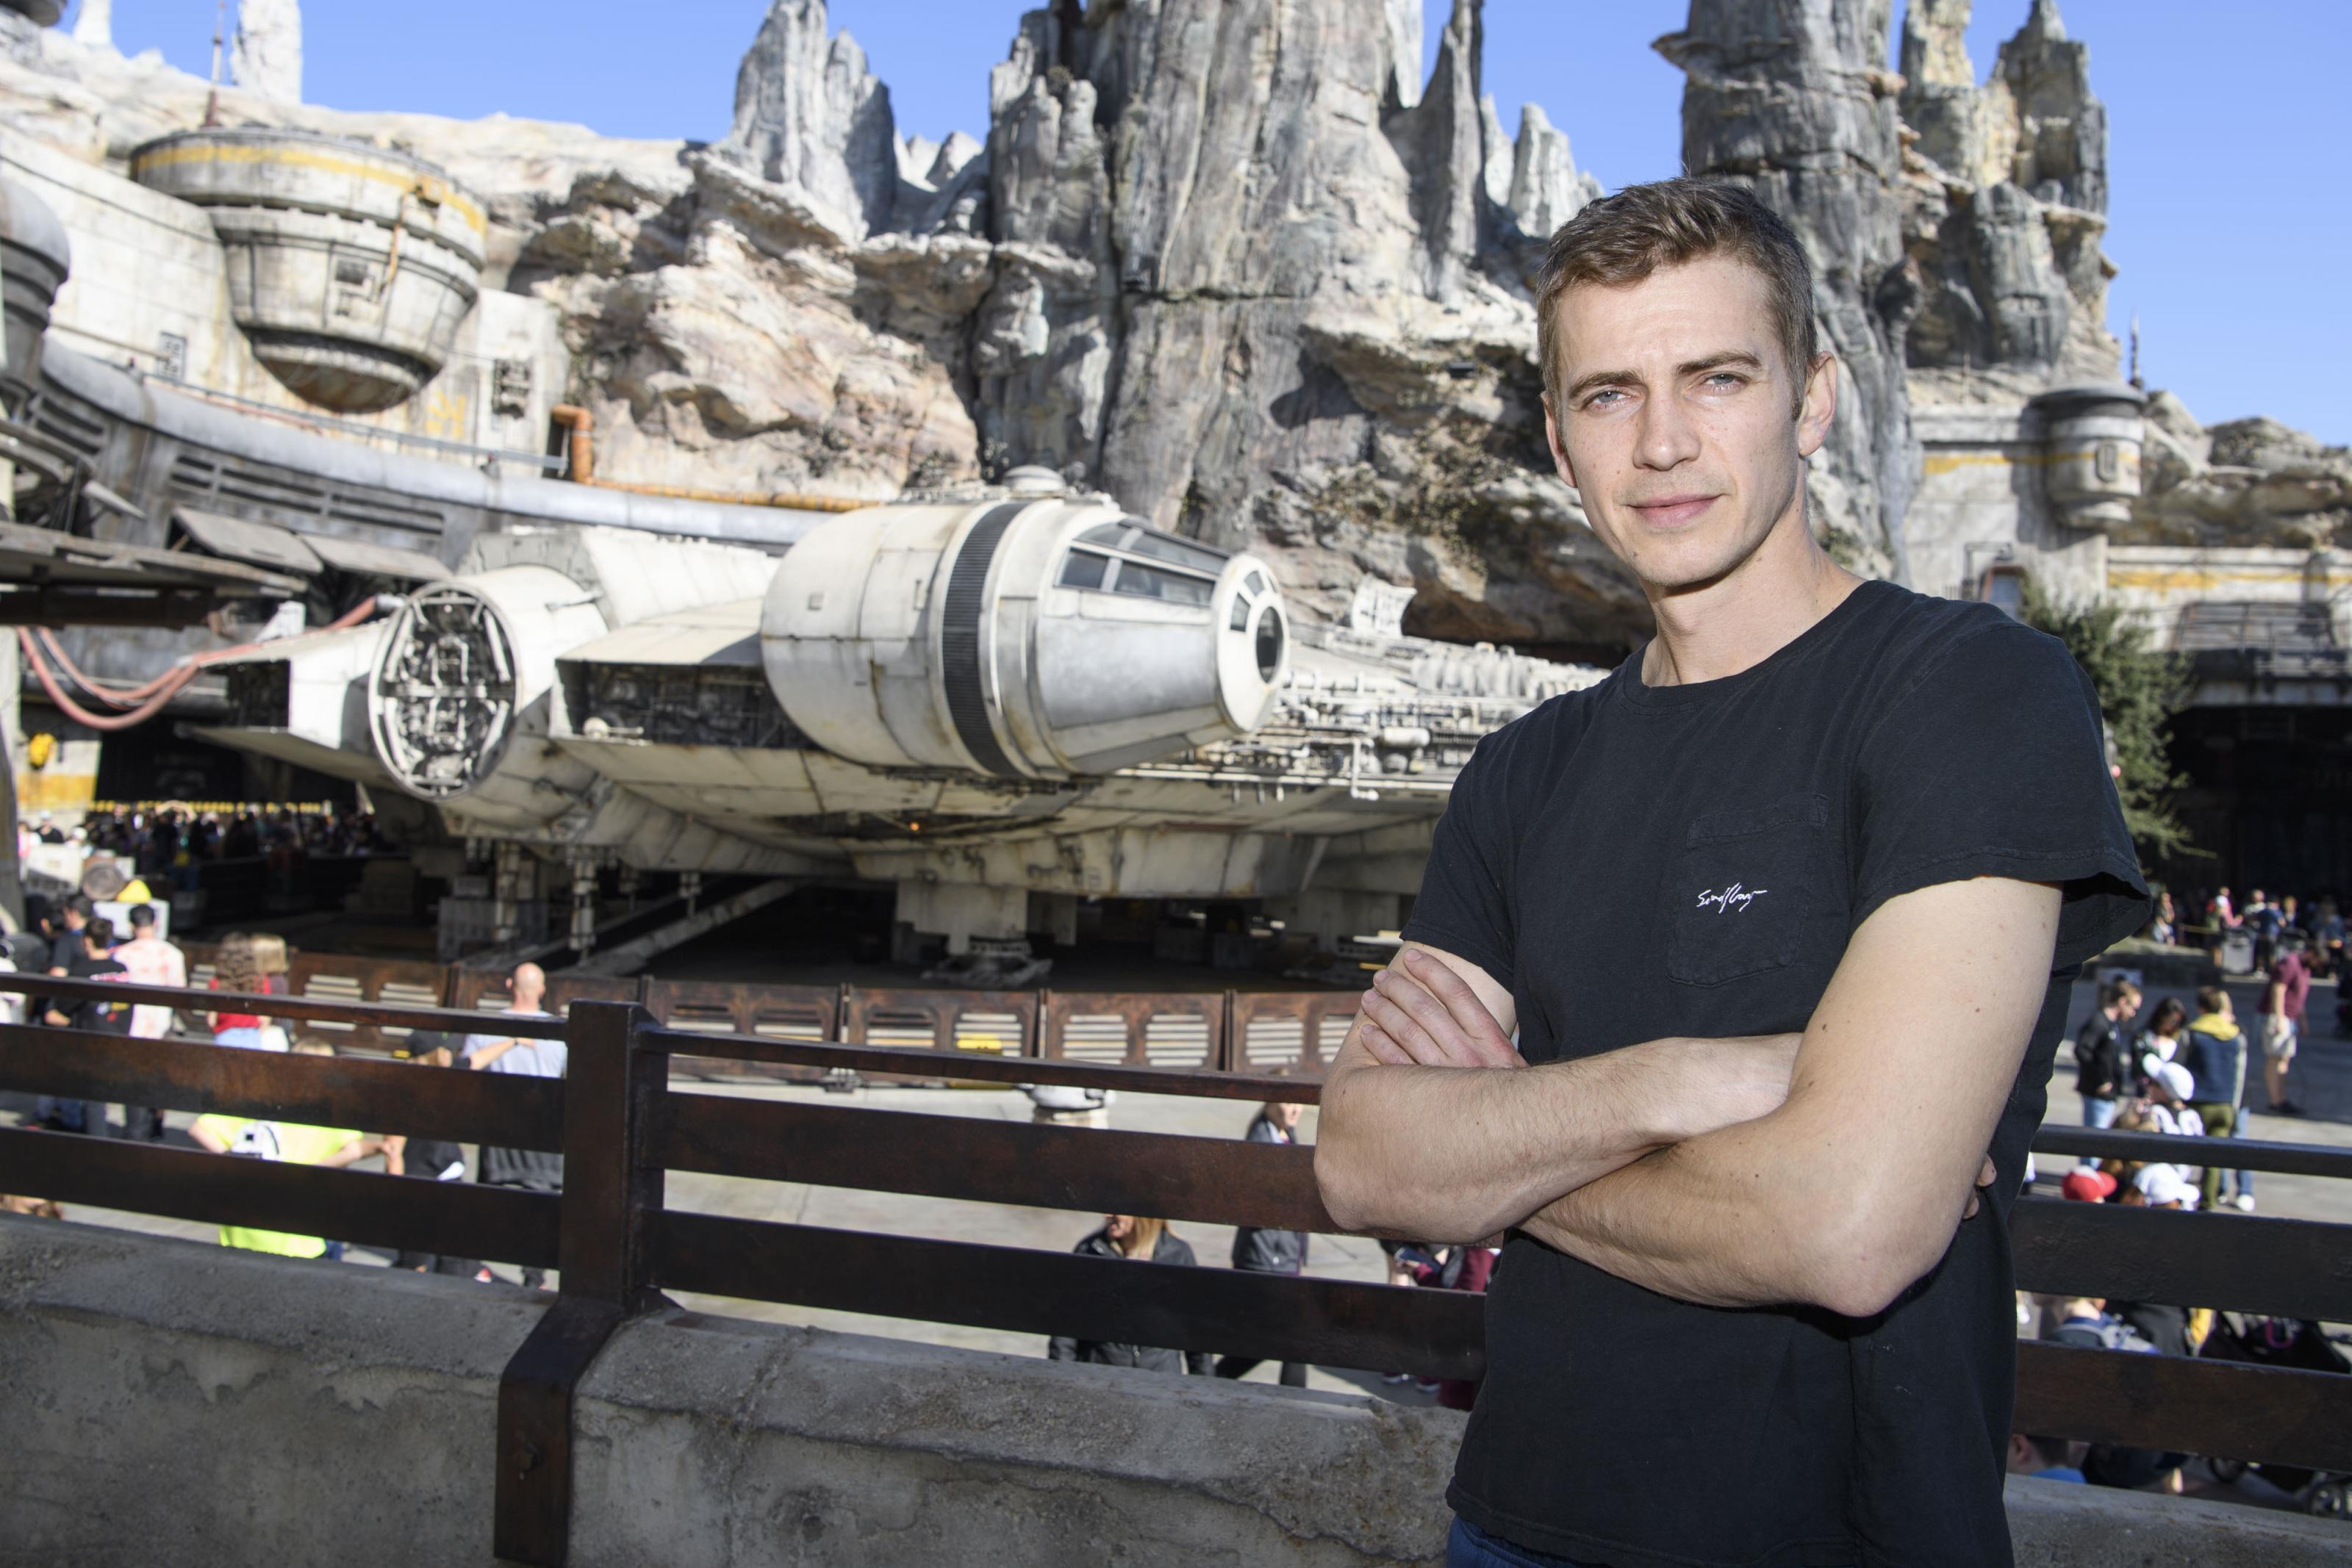 Rumorville Hayden Christensen Has A Cameo In The Rise Of Skywalker